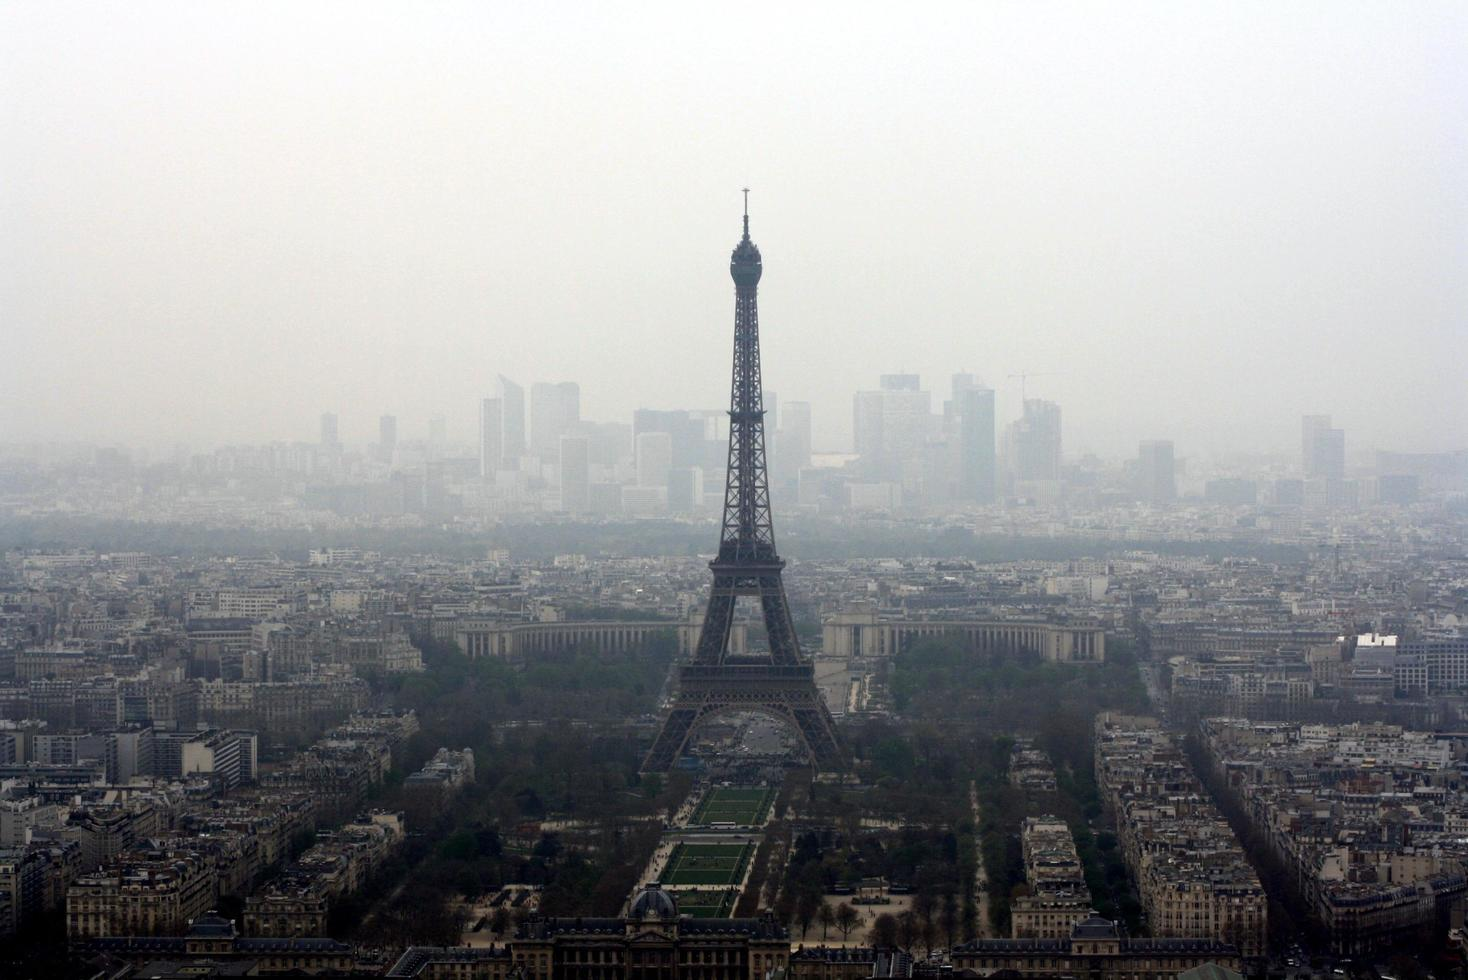 torre eiffel nella nebbia foto